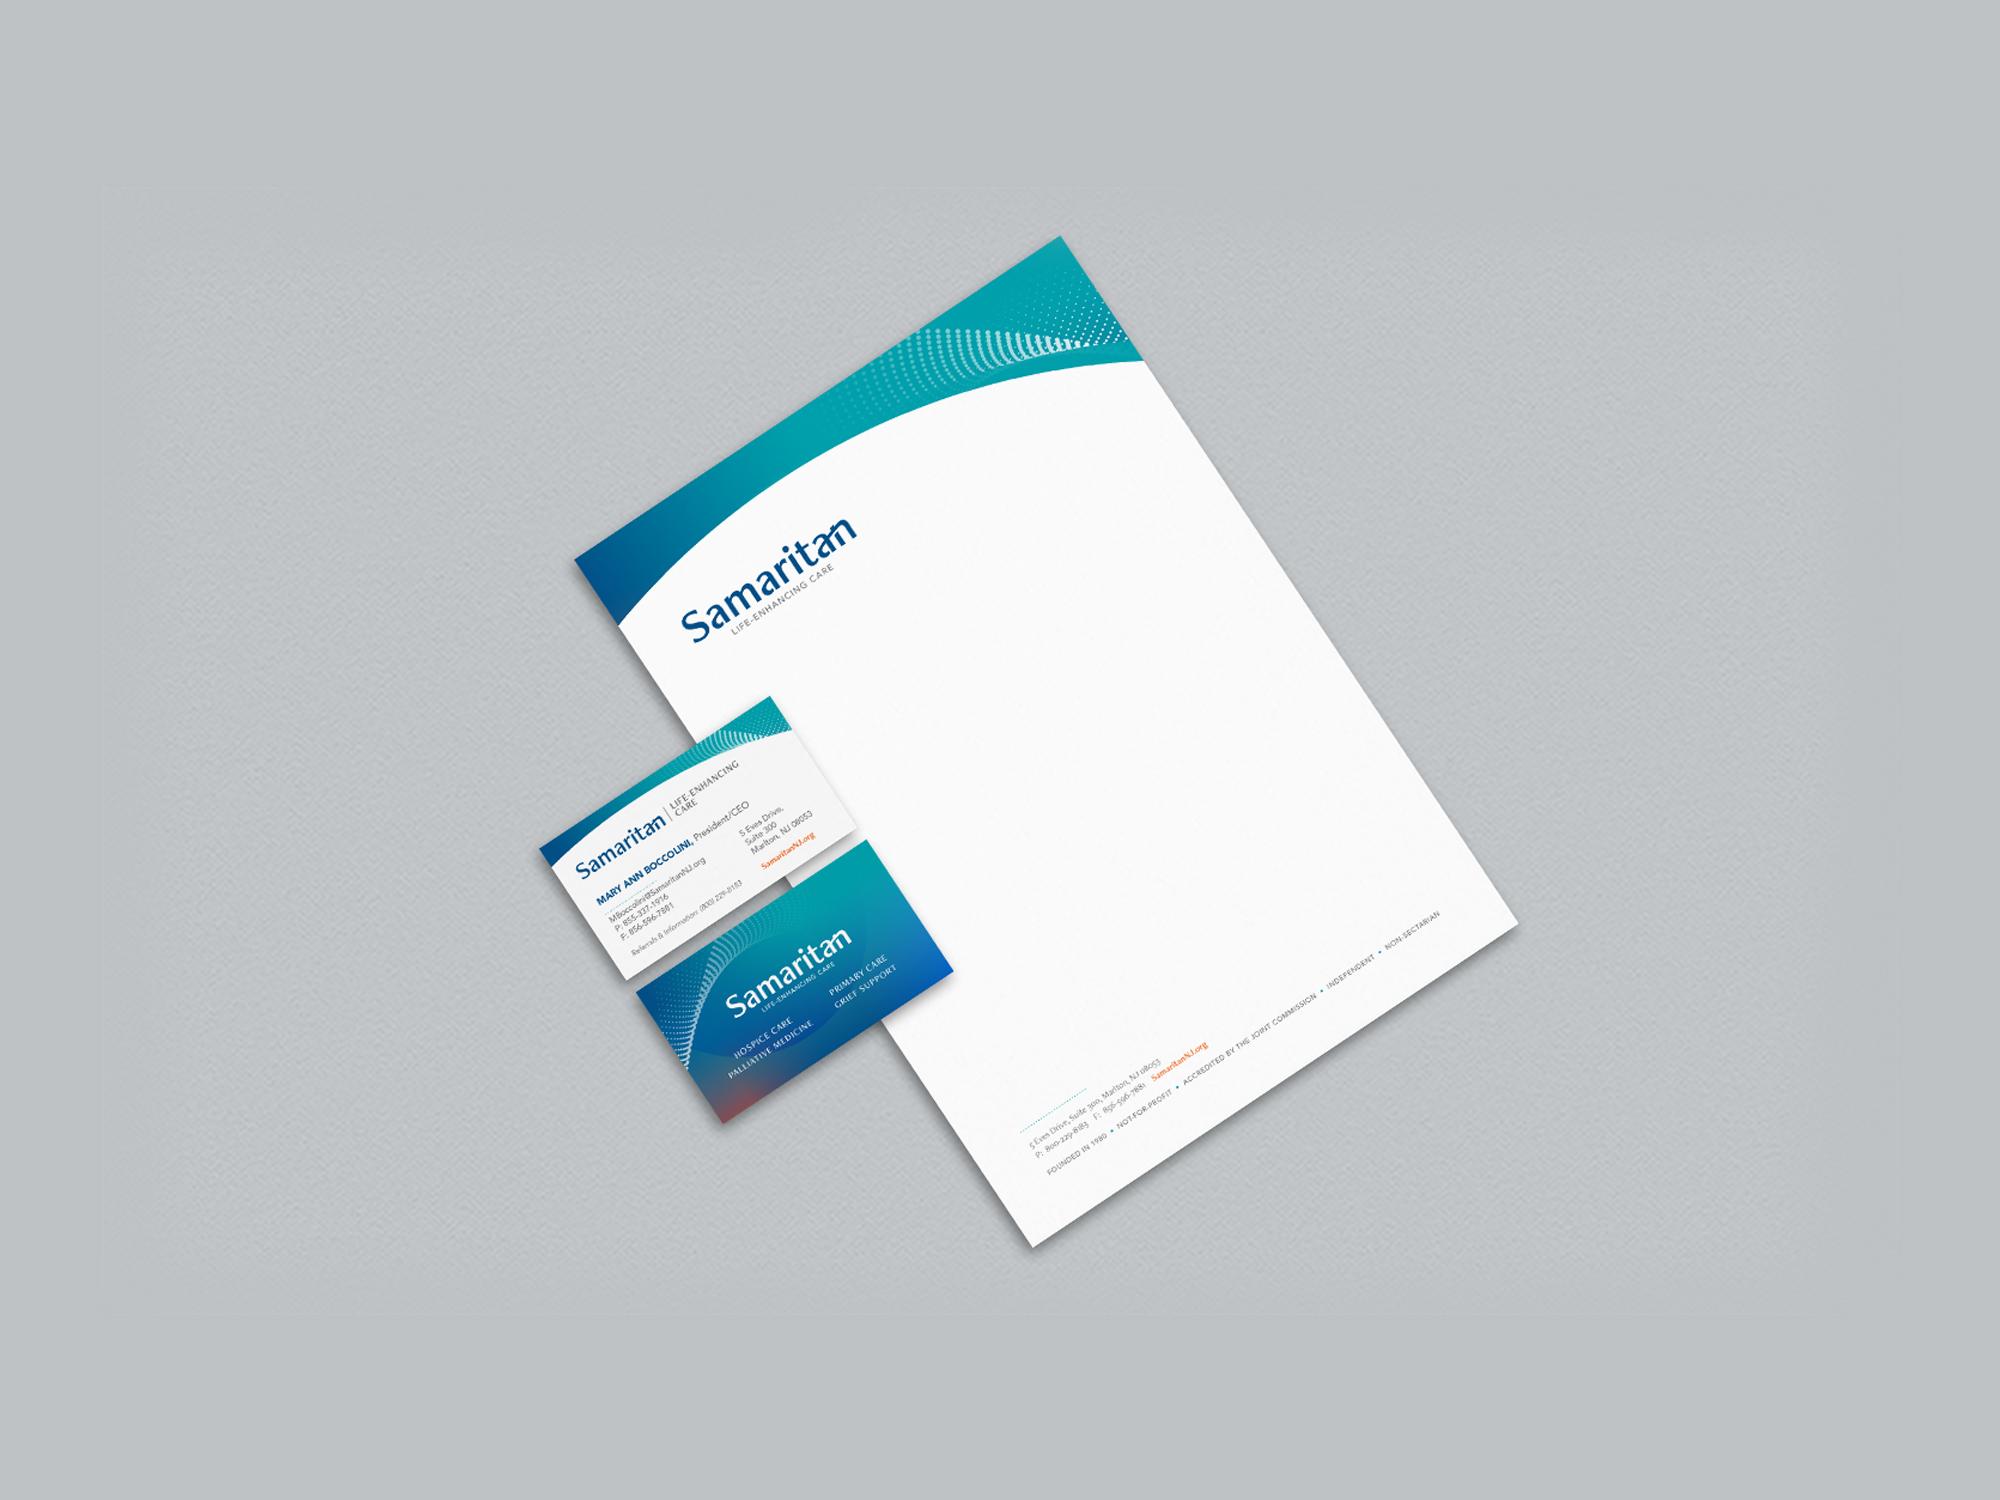 hospice and palliative care brochure